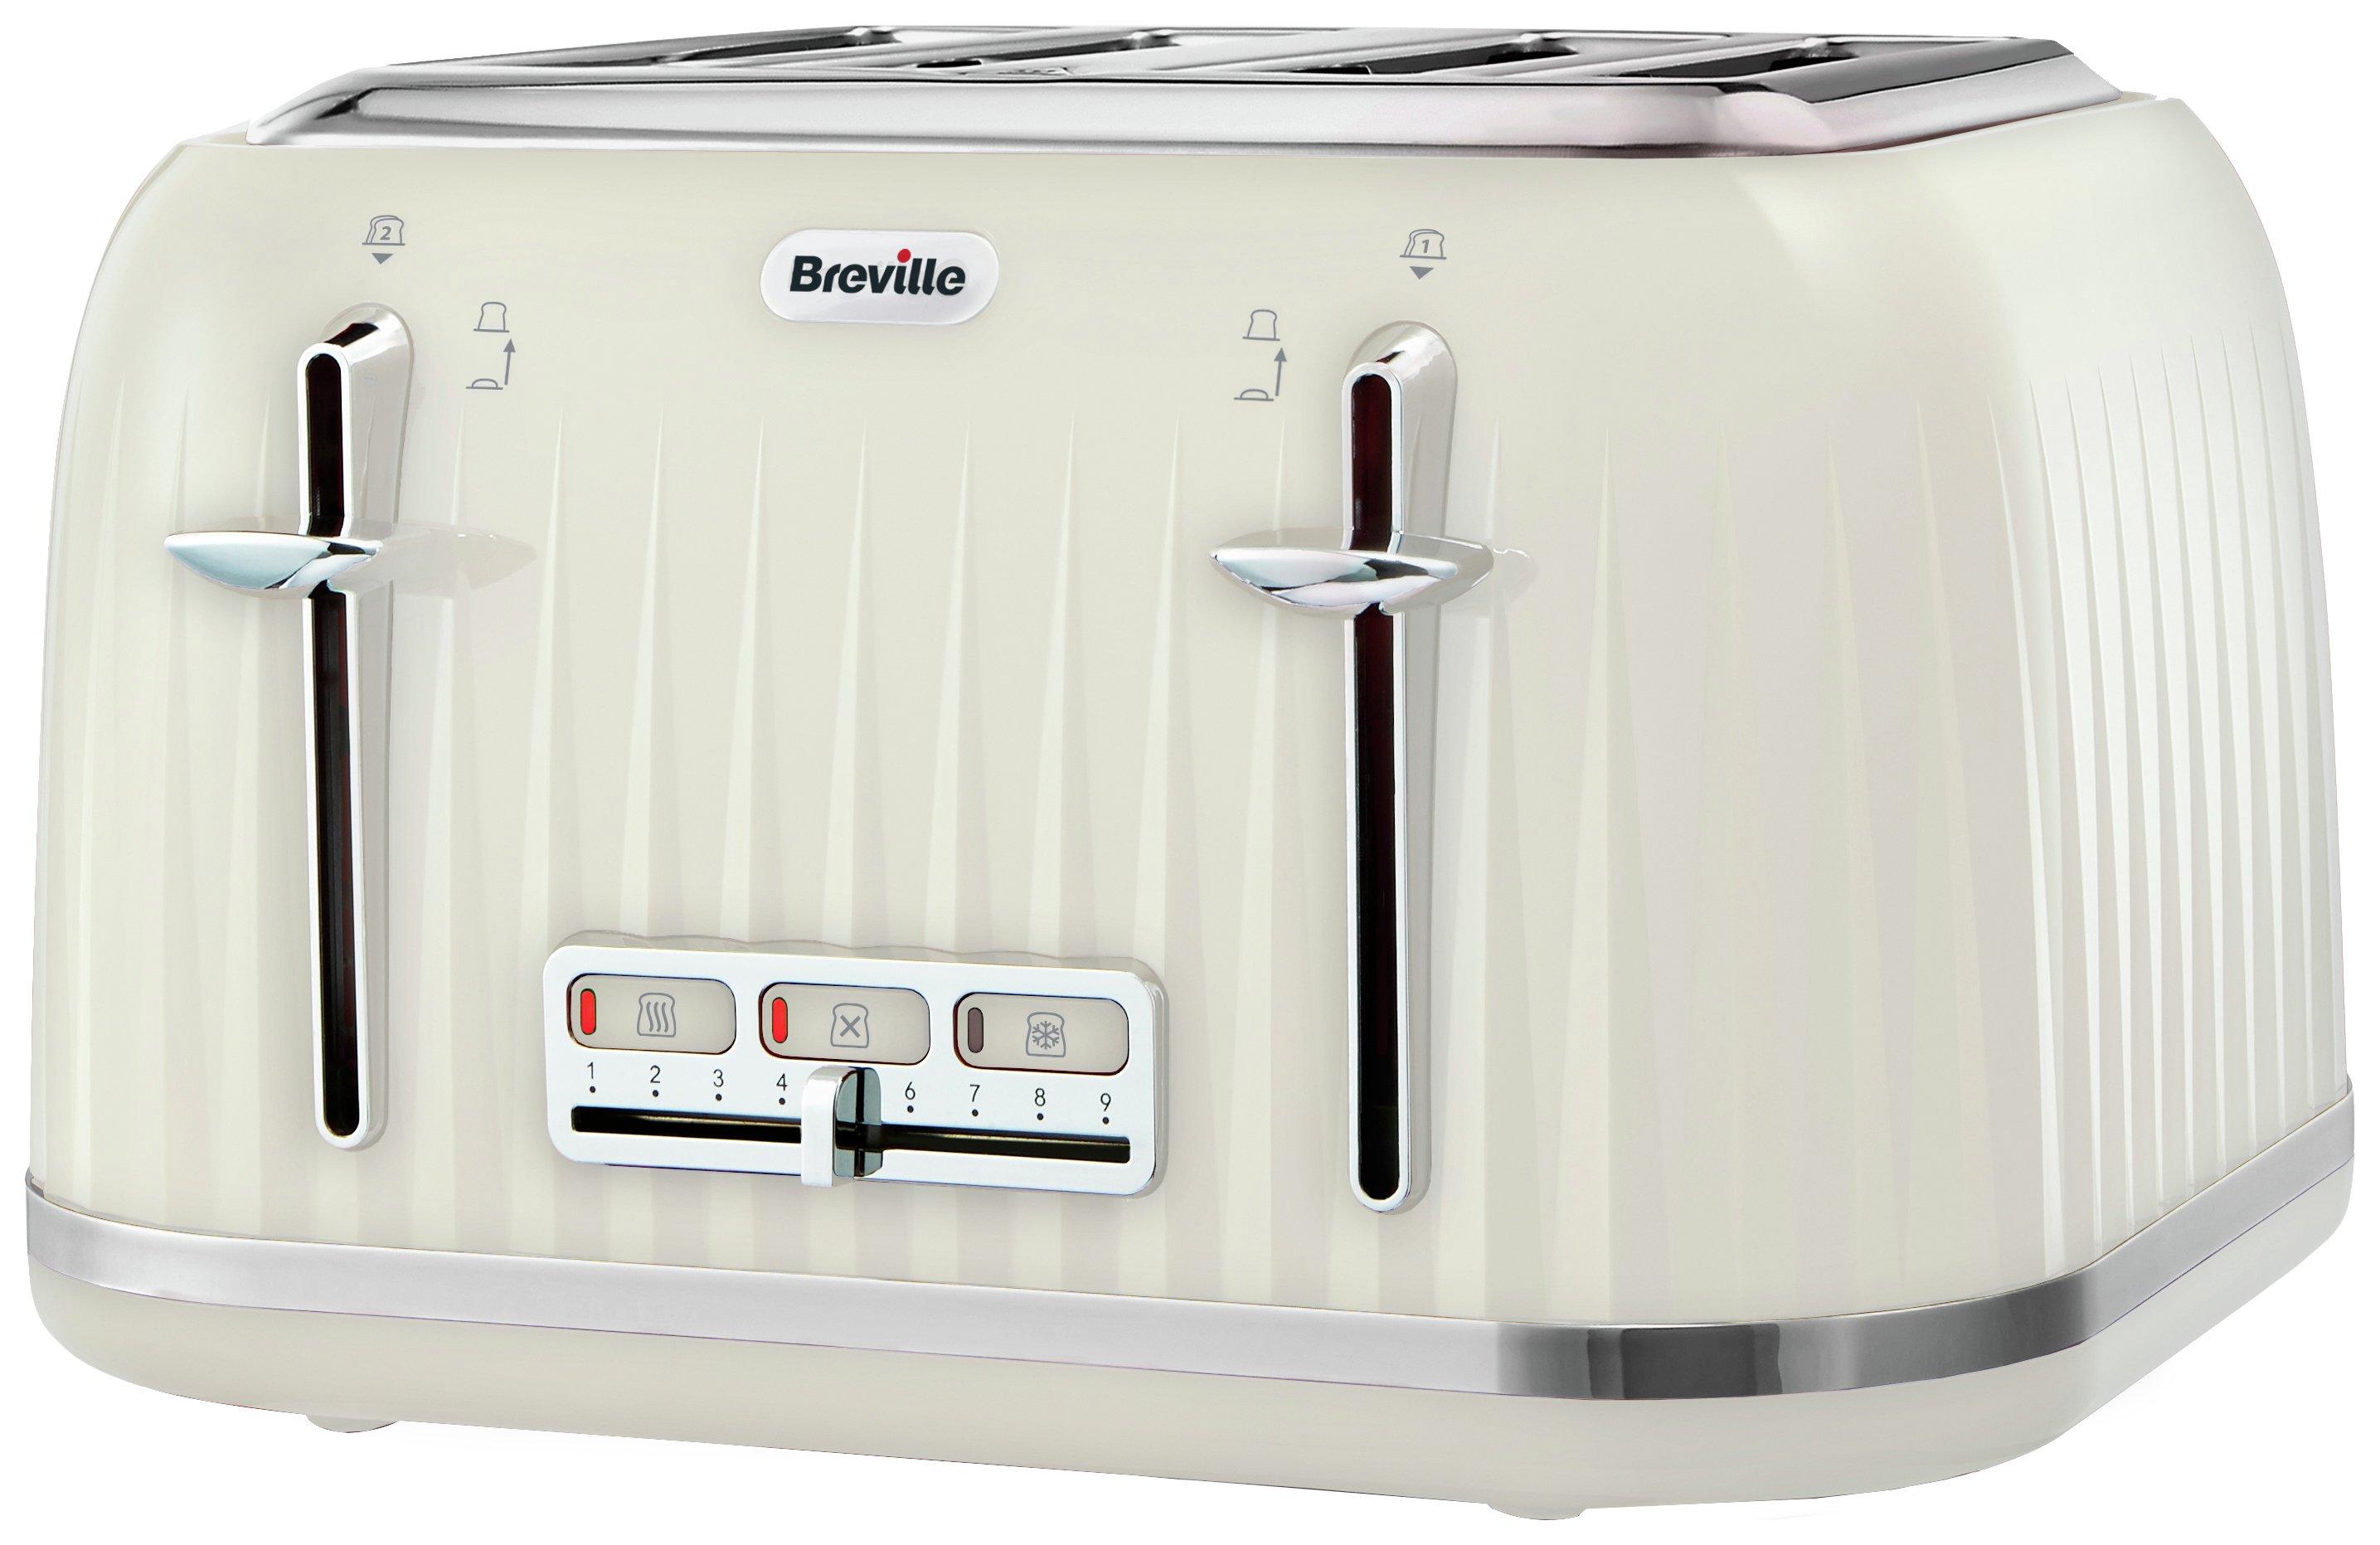 Breville - Impressions 4 Slice Toaster - Cream